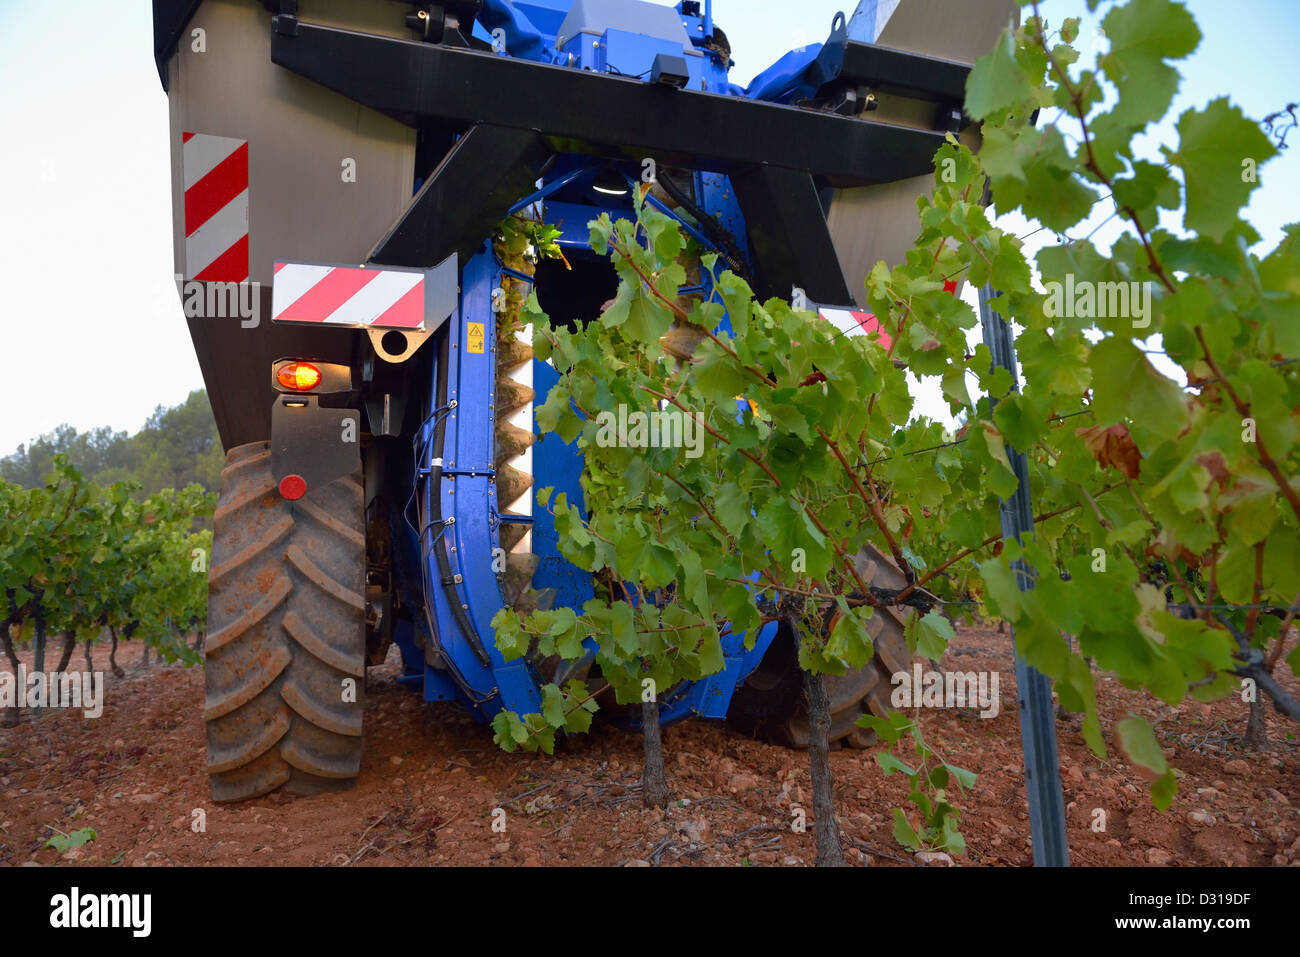 Grape combine harvester machine in vineyards near Sainte-Victoire mountain, Trets, Rhone region, France - Stock Image